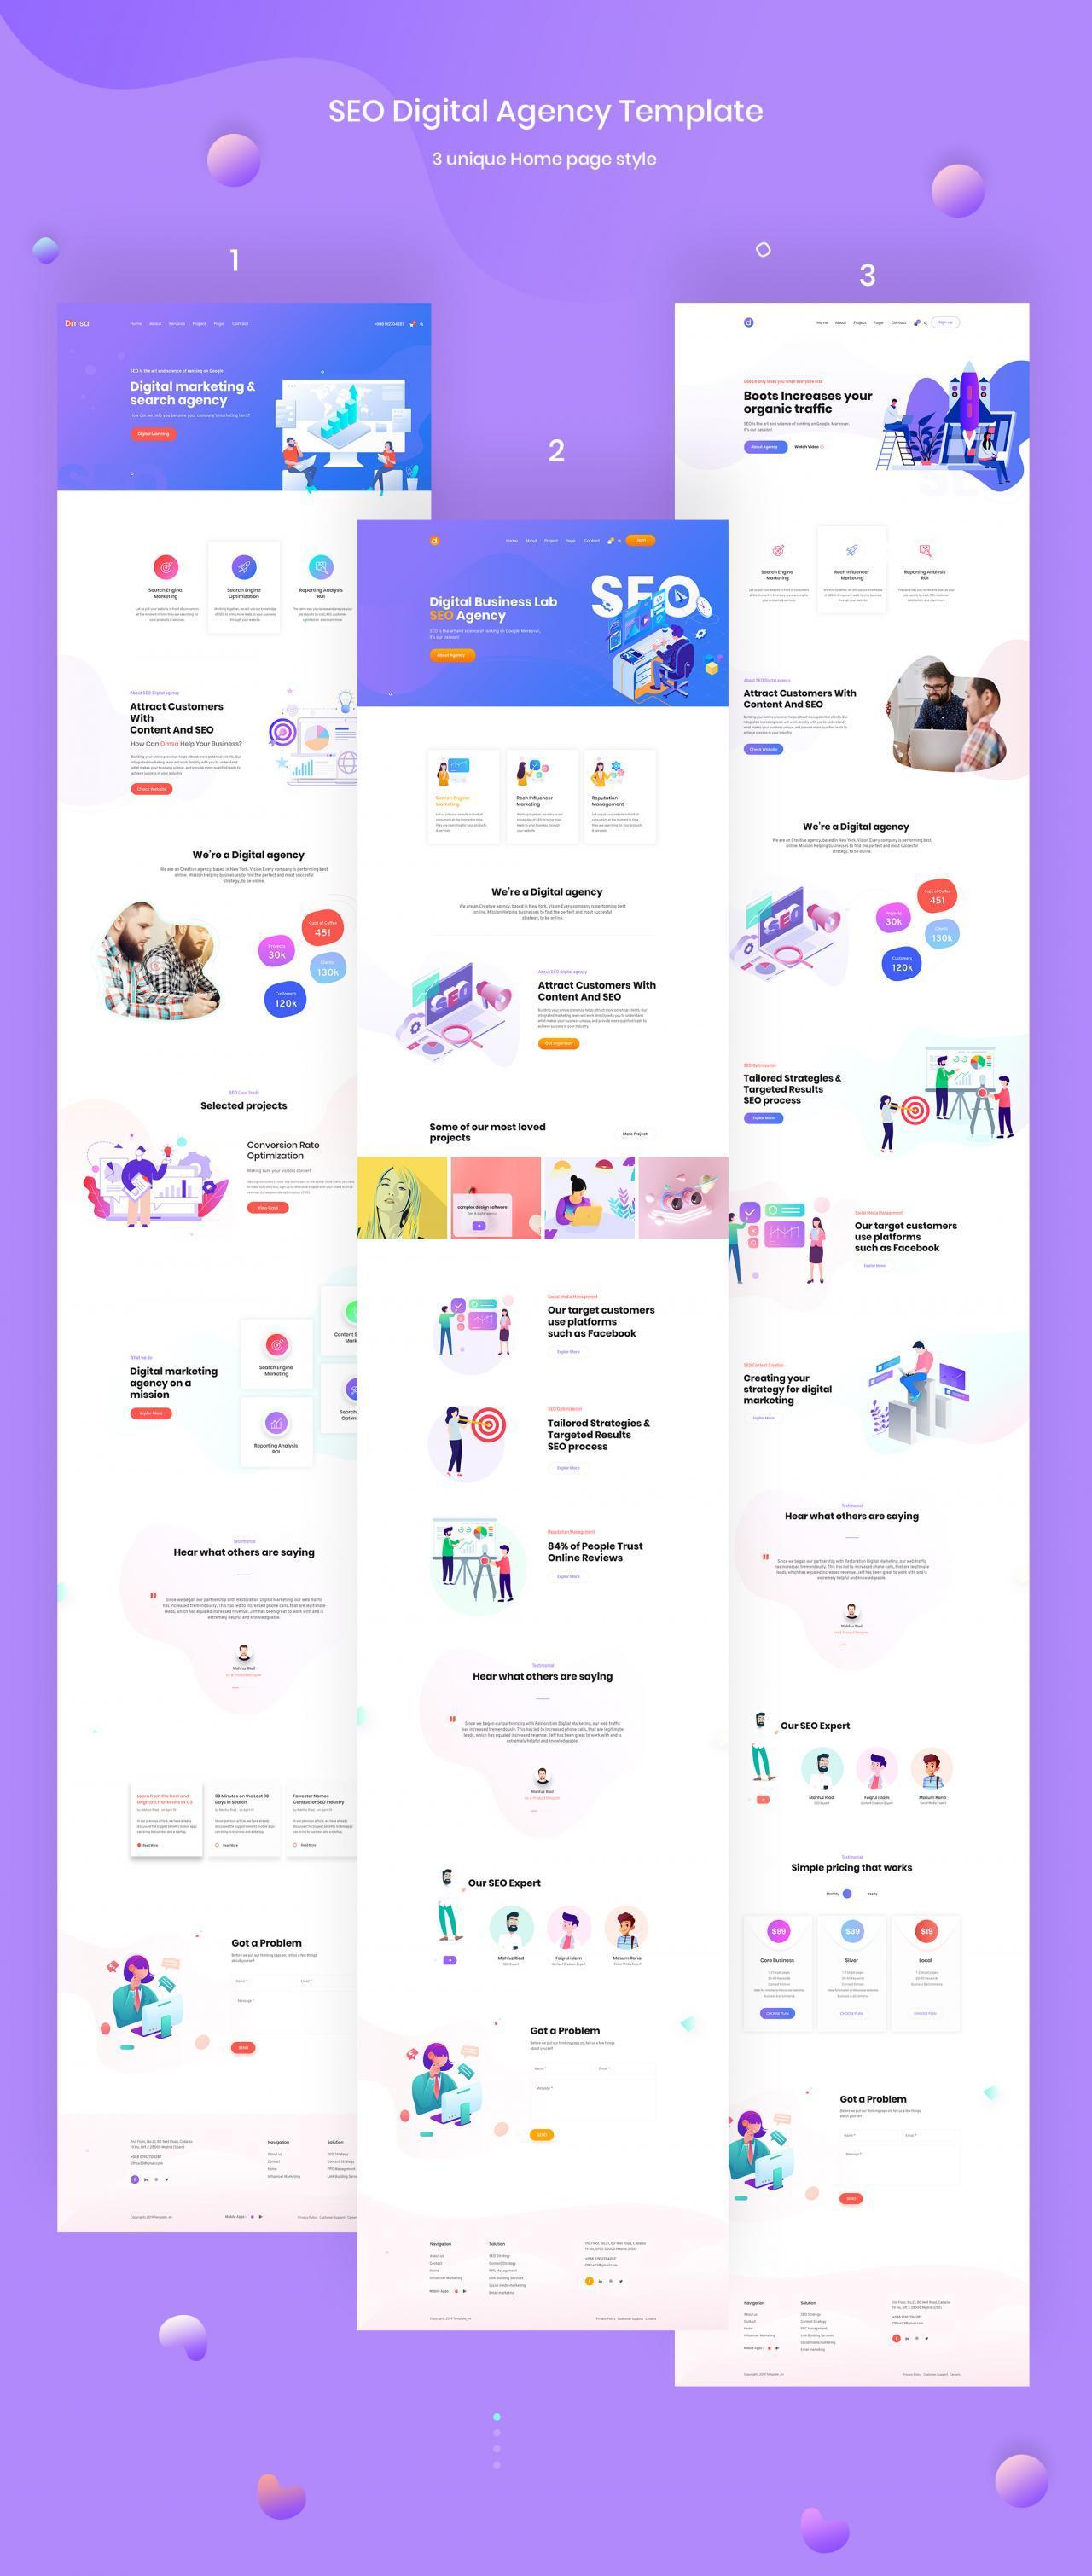 SEO优化WEB企业网站UI界面设计模板套件 Dmsa – SEO & Digital Agency Template插图(6)